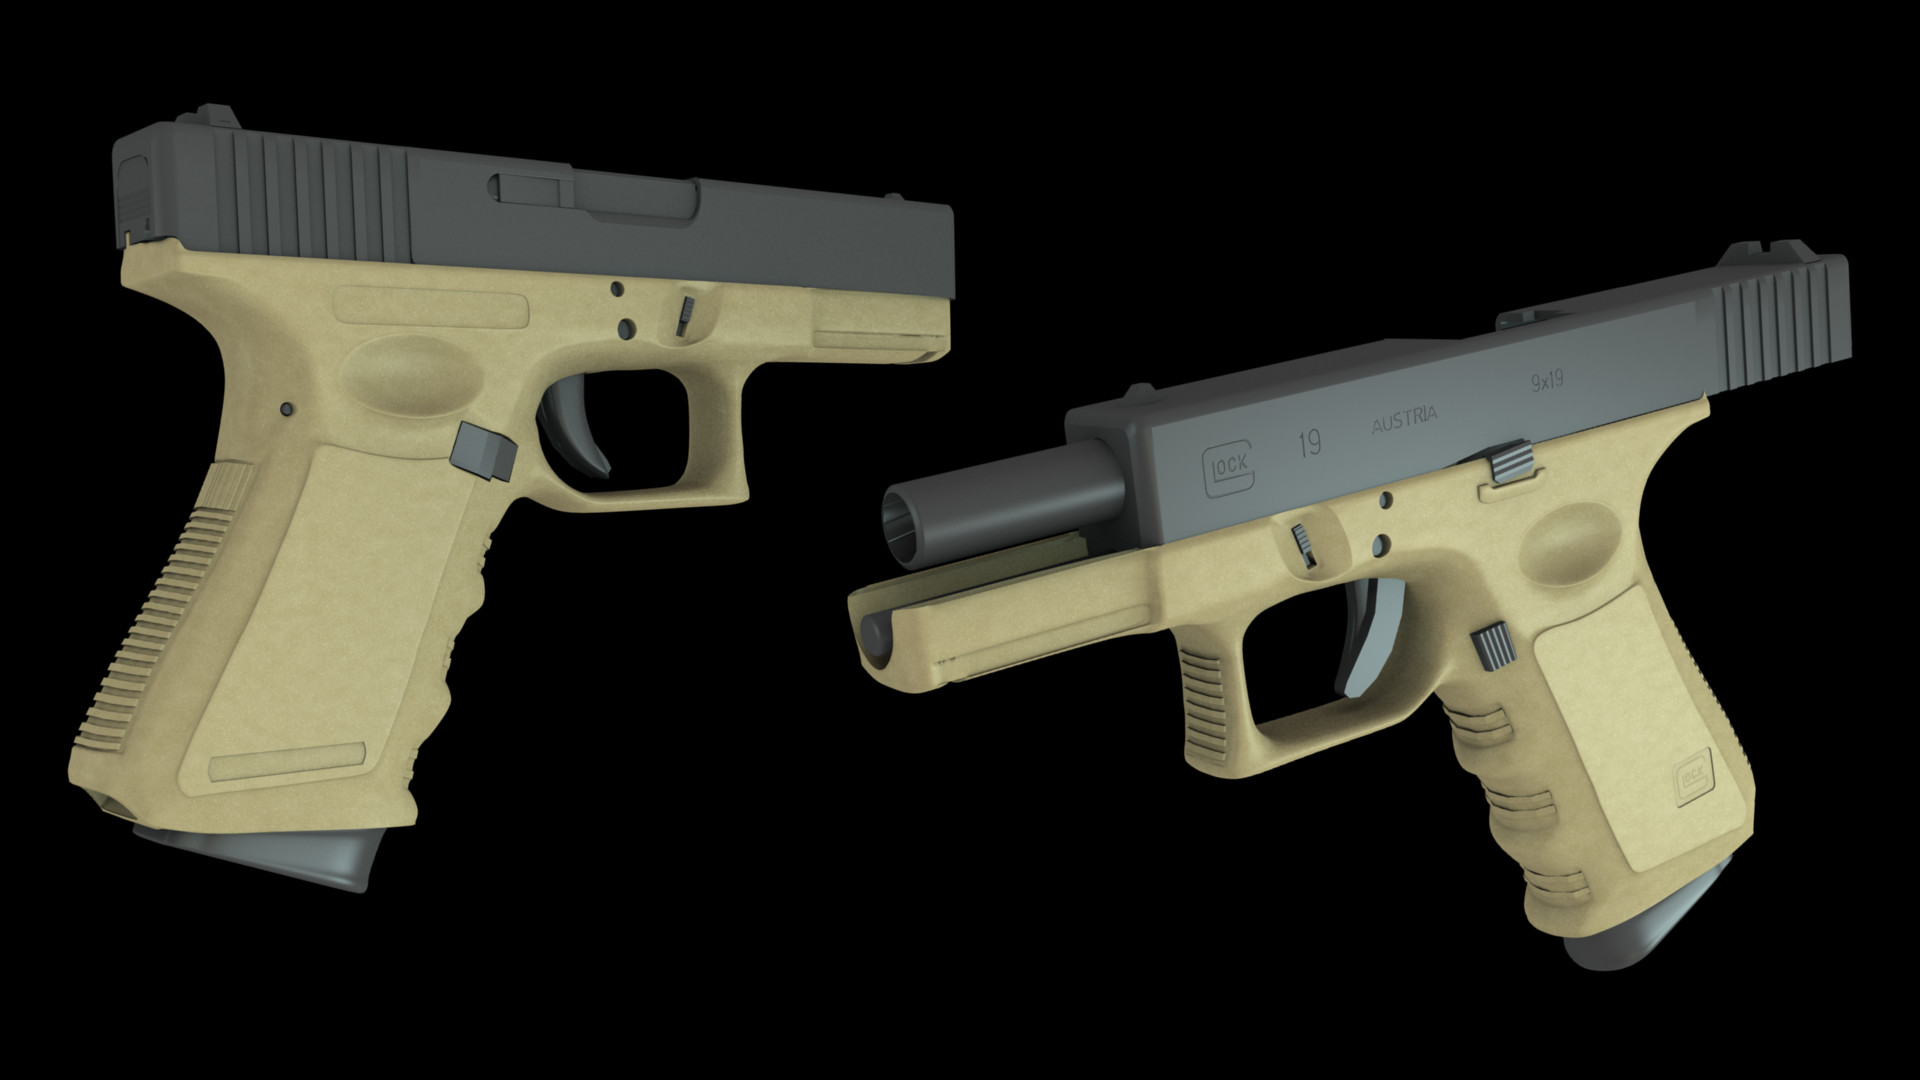 Res: 1920x1080, Glock 19 Wallpaper Comreport media wip glock 19